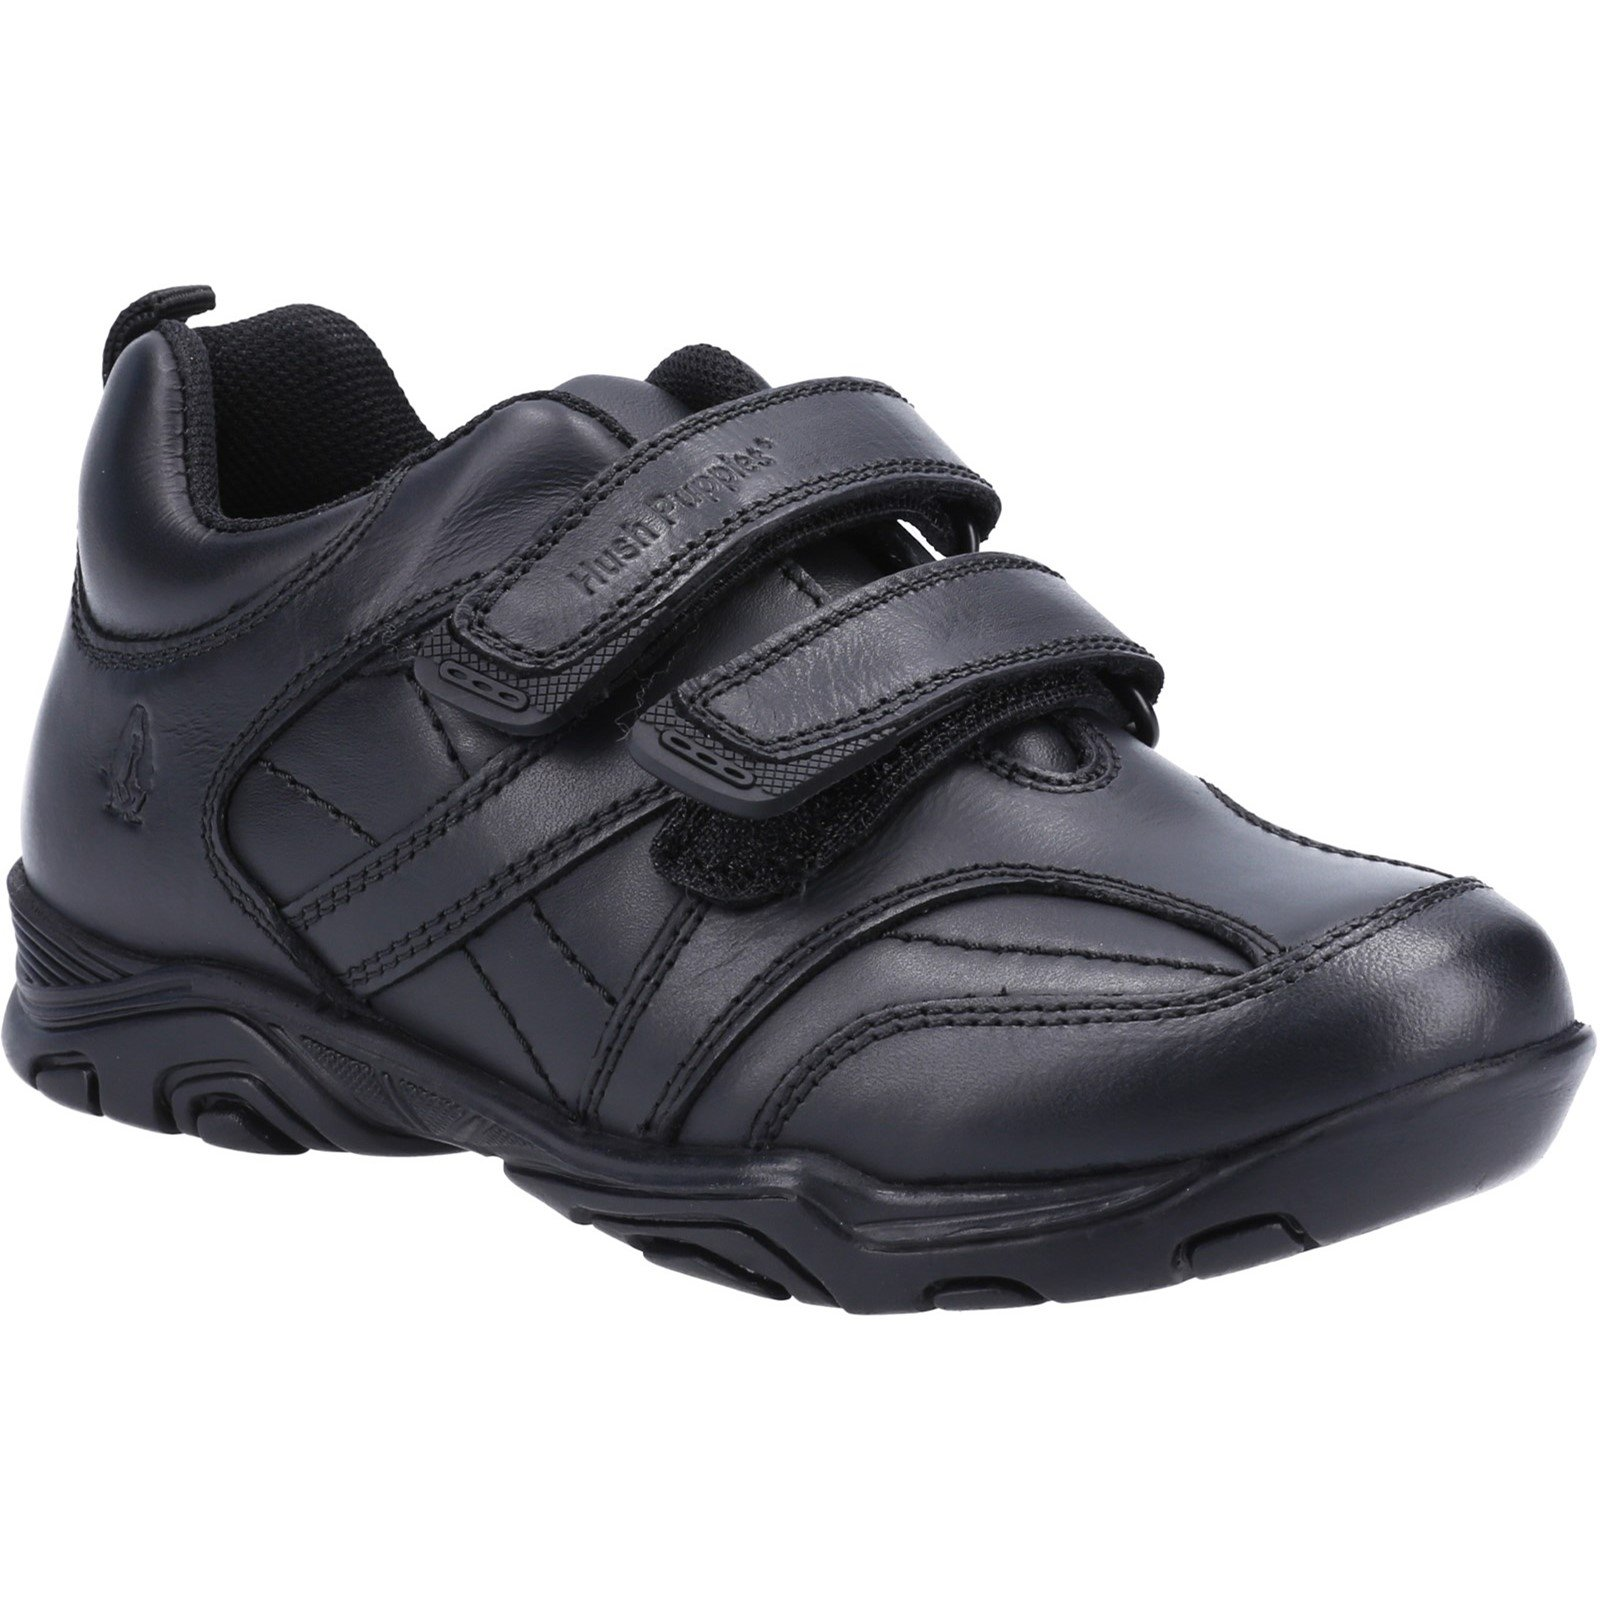 Hush Puppies Kid's Levi Infant School Shoe Black 32629 - Black 12